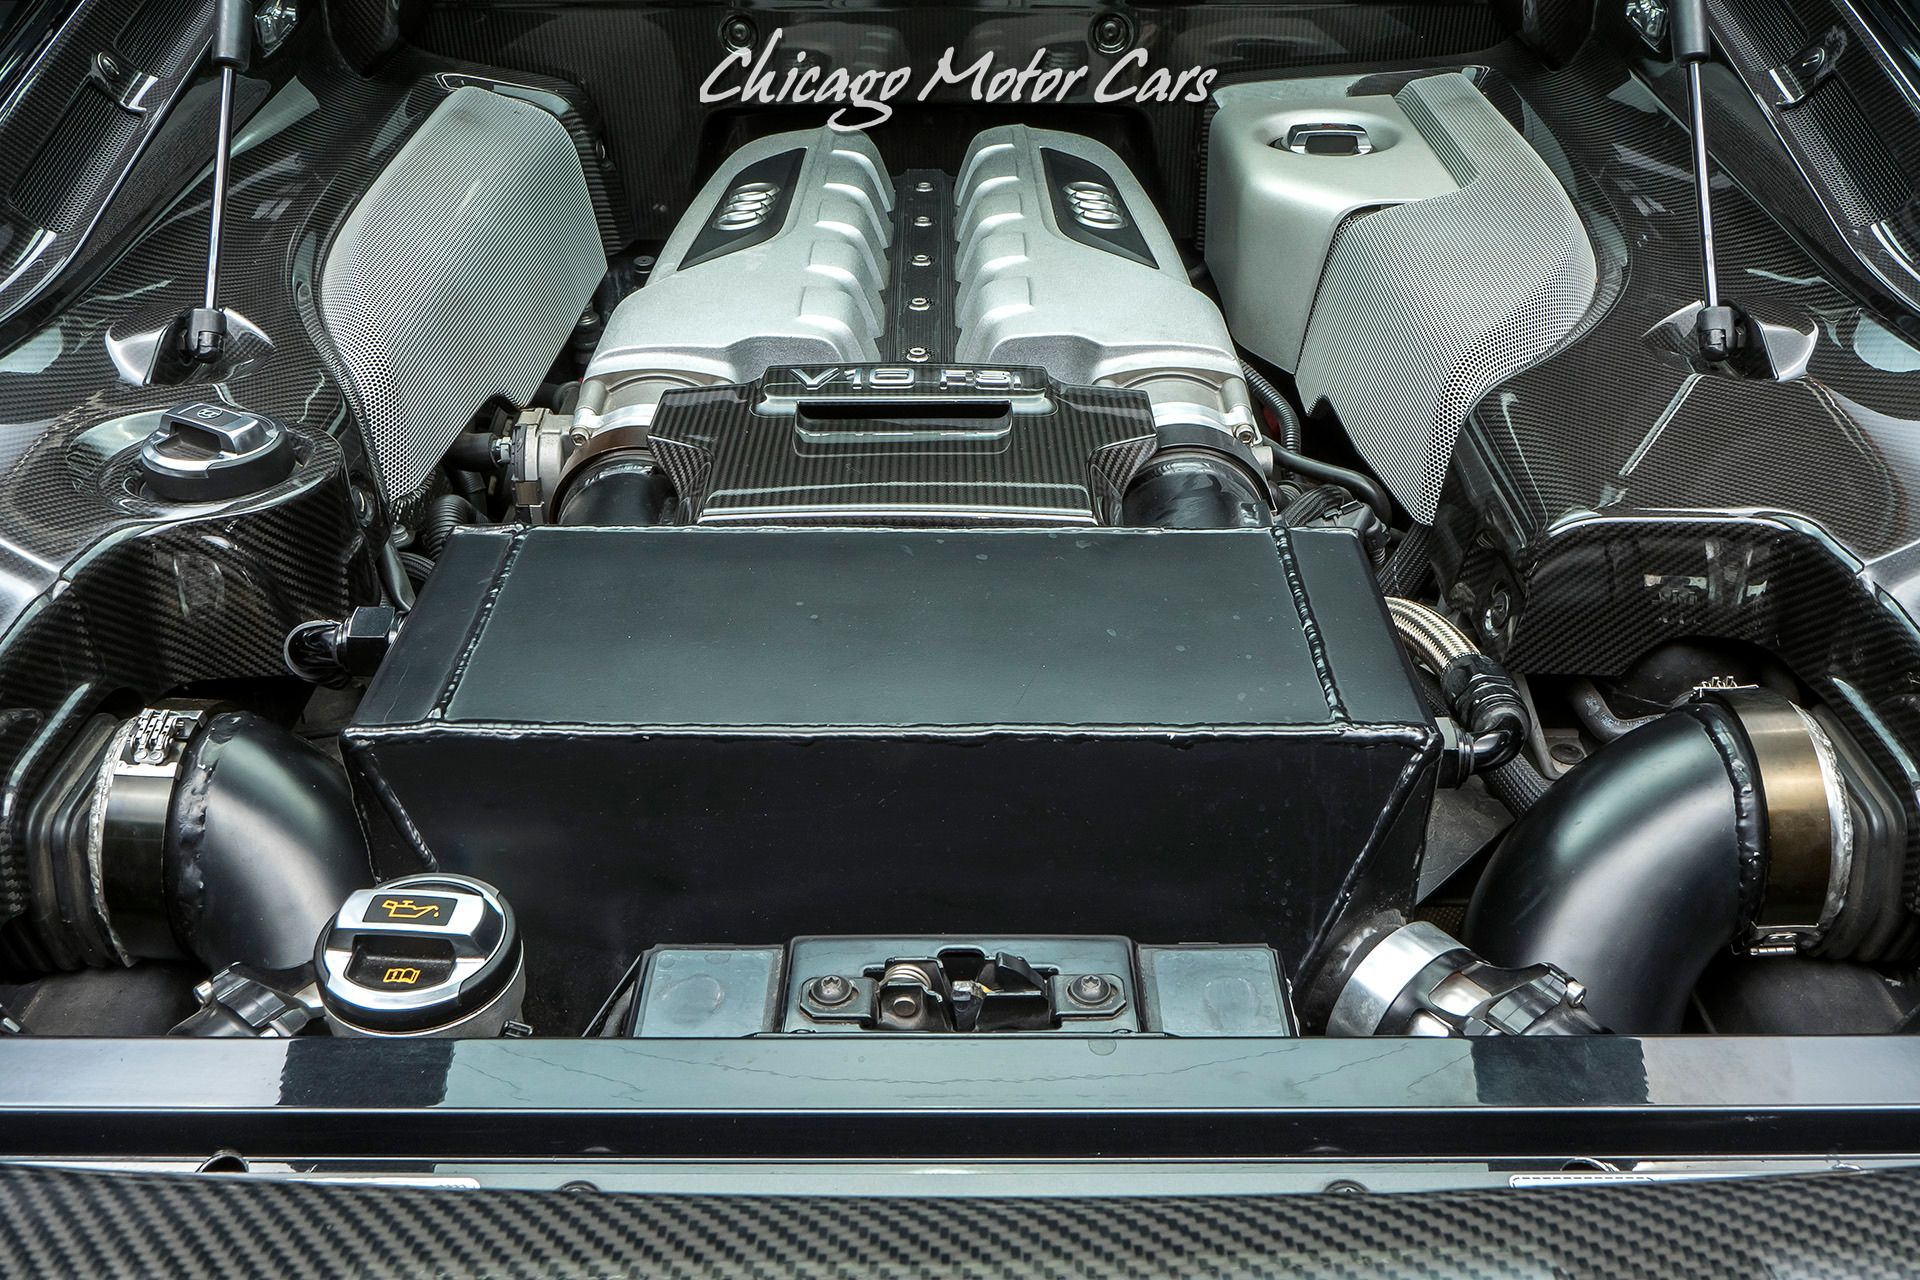 2012 Audi R8 V10 Twin Turbo 900 Hp Chicago Motor Cars United States For Sale On Luxurypulse 2012 Audi R8 Audi R8 Audi R8 V10